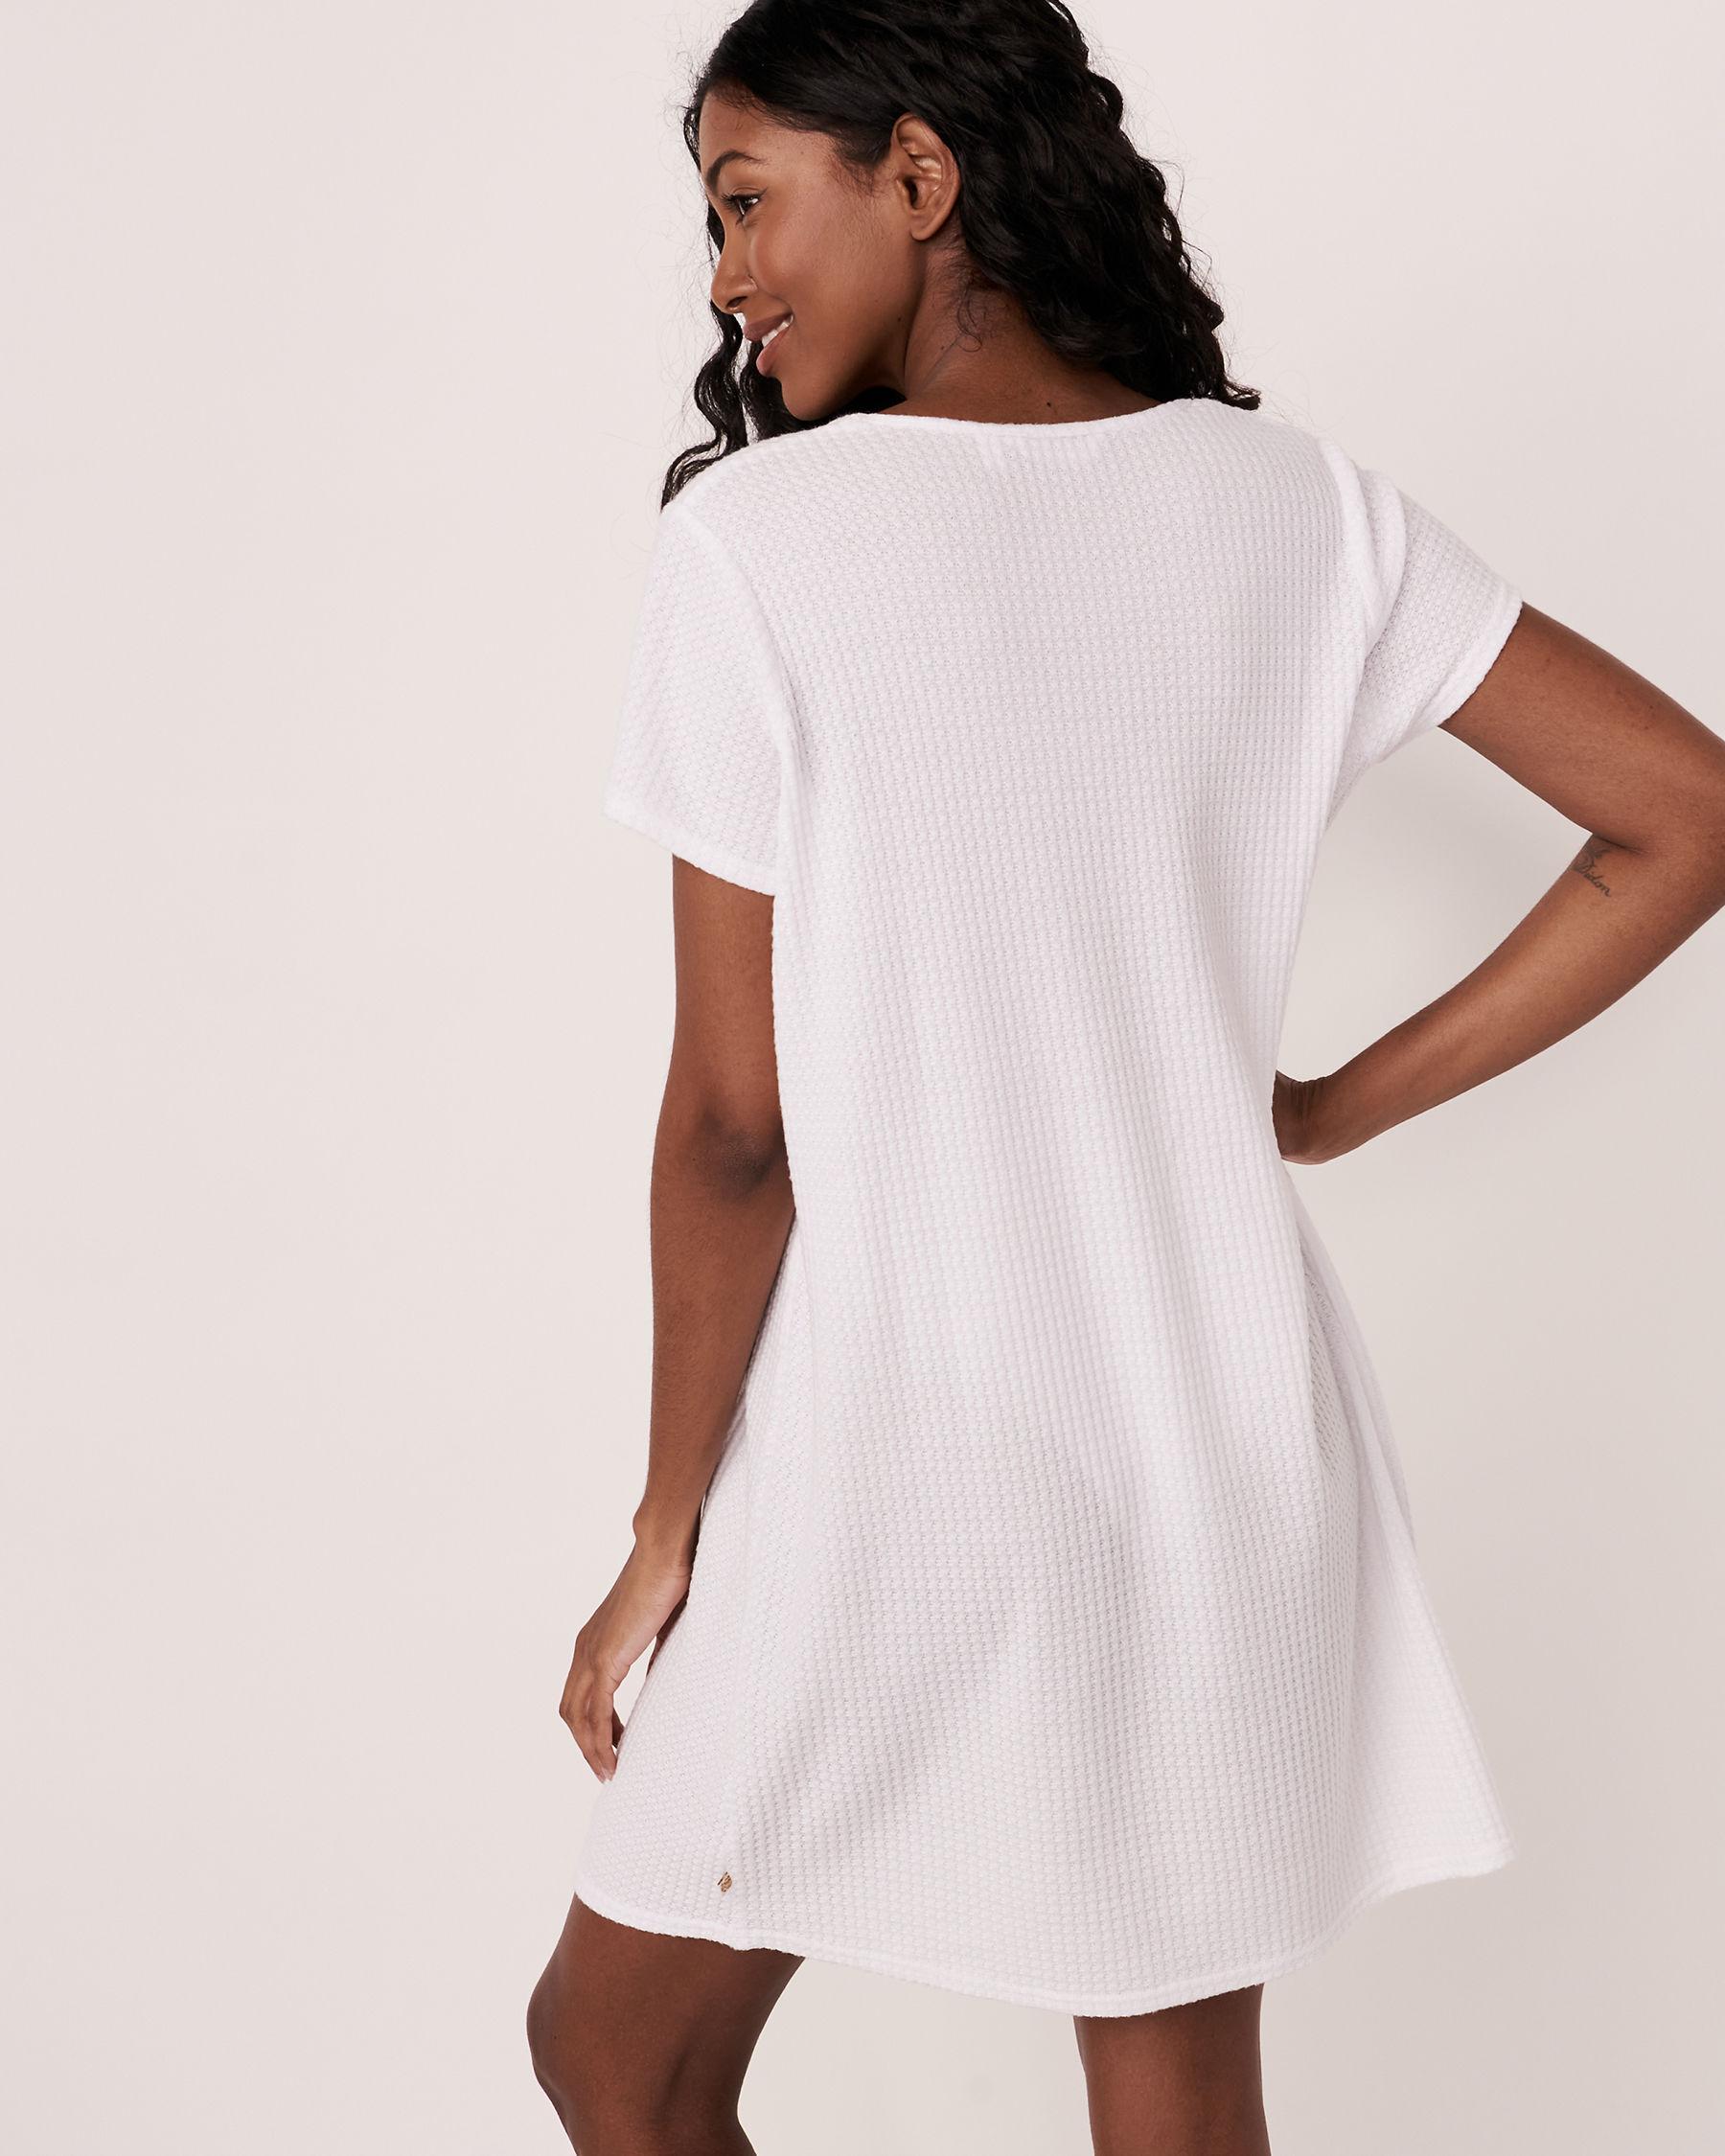 LA VIE EN ROSE AQUA Twisted Short Dress White 80300017 - View4